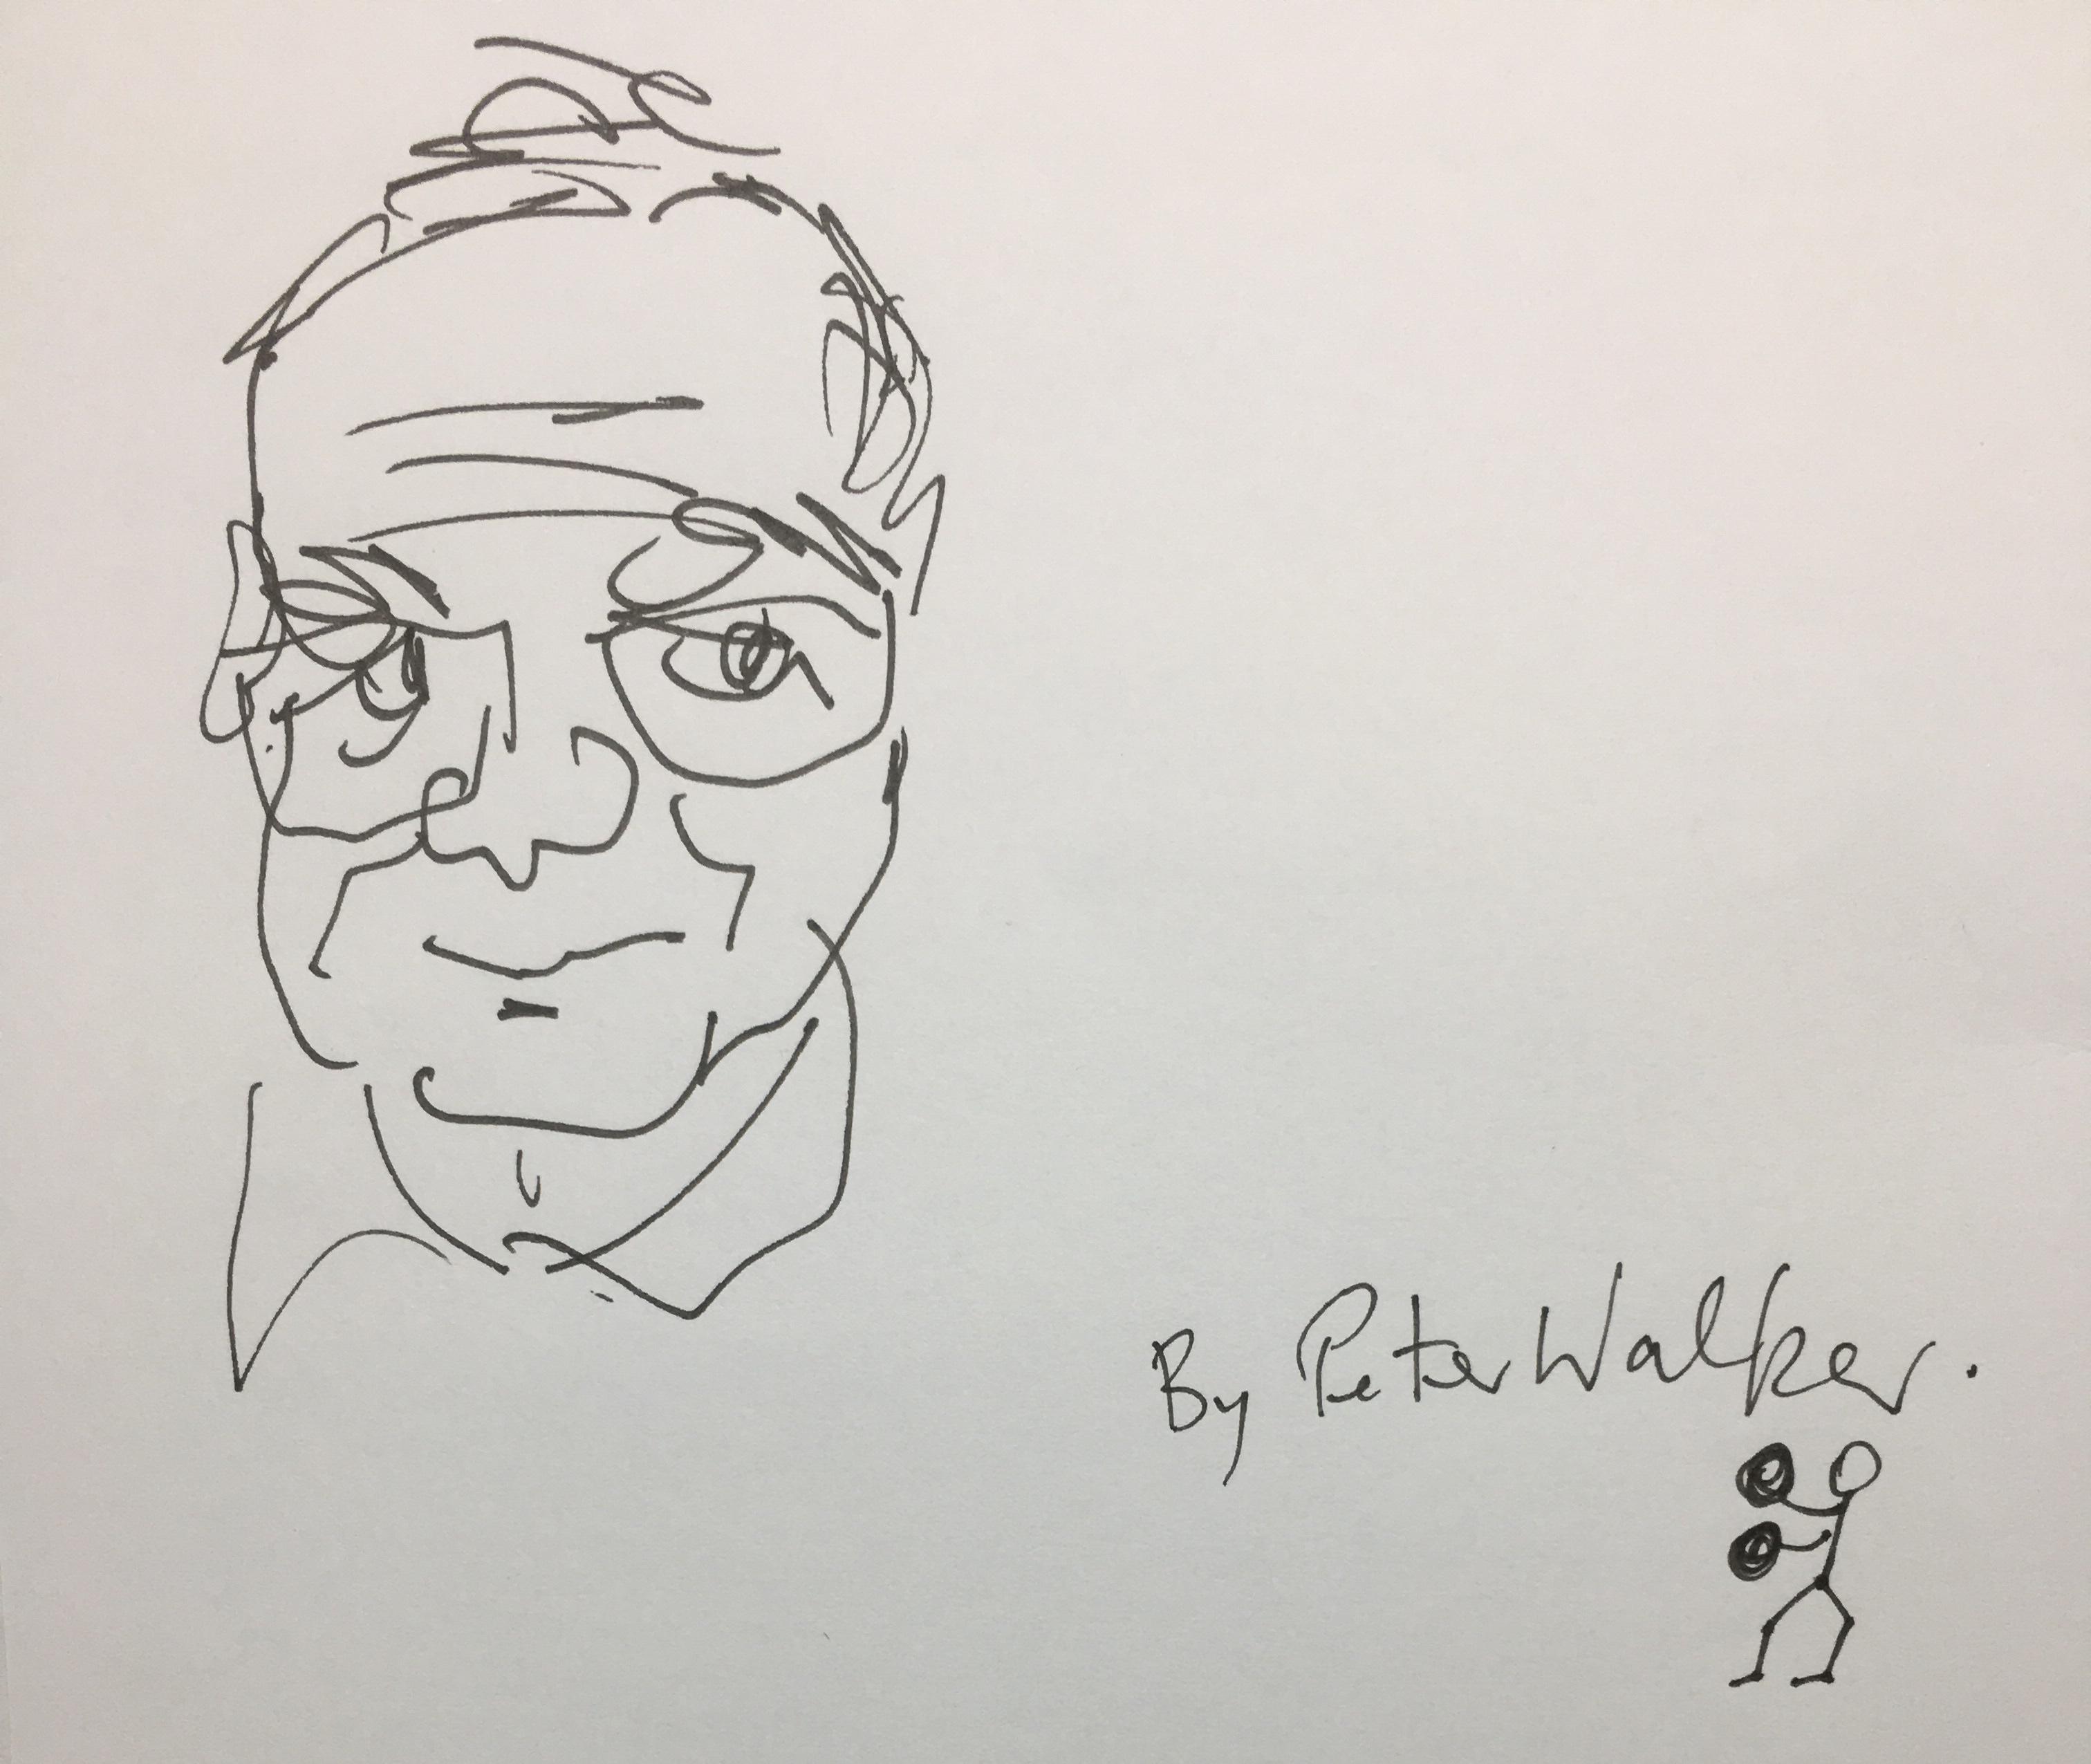 Roger, ink drawing by Peter Walker